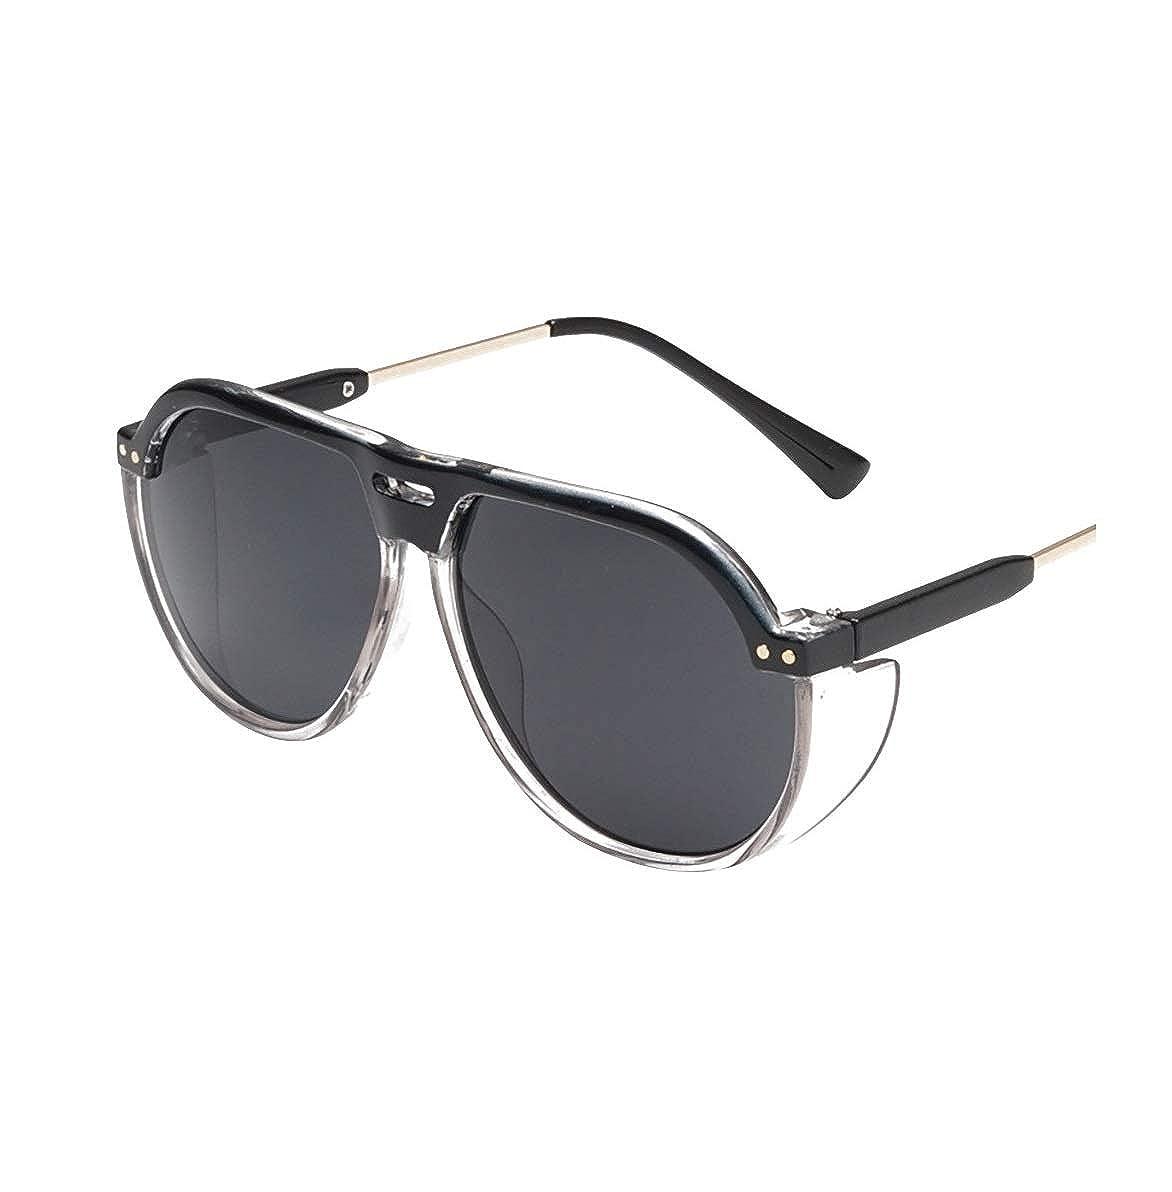 BOBOLover Gafas de Sol Hombre Mujer UV400 Protecci/ón Gafas de sol Polarizado Super Ligero Marco Gafas de Sol Polarizadas